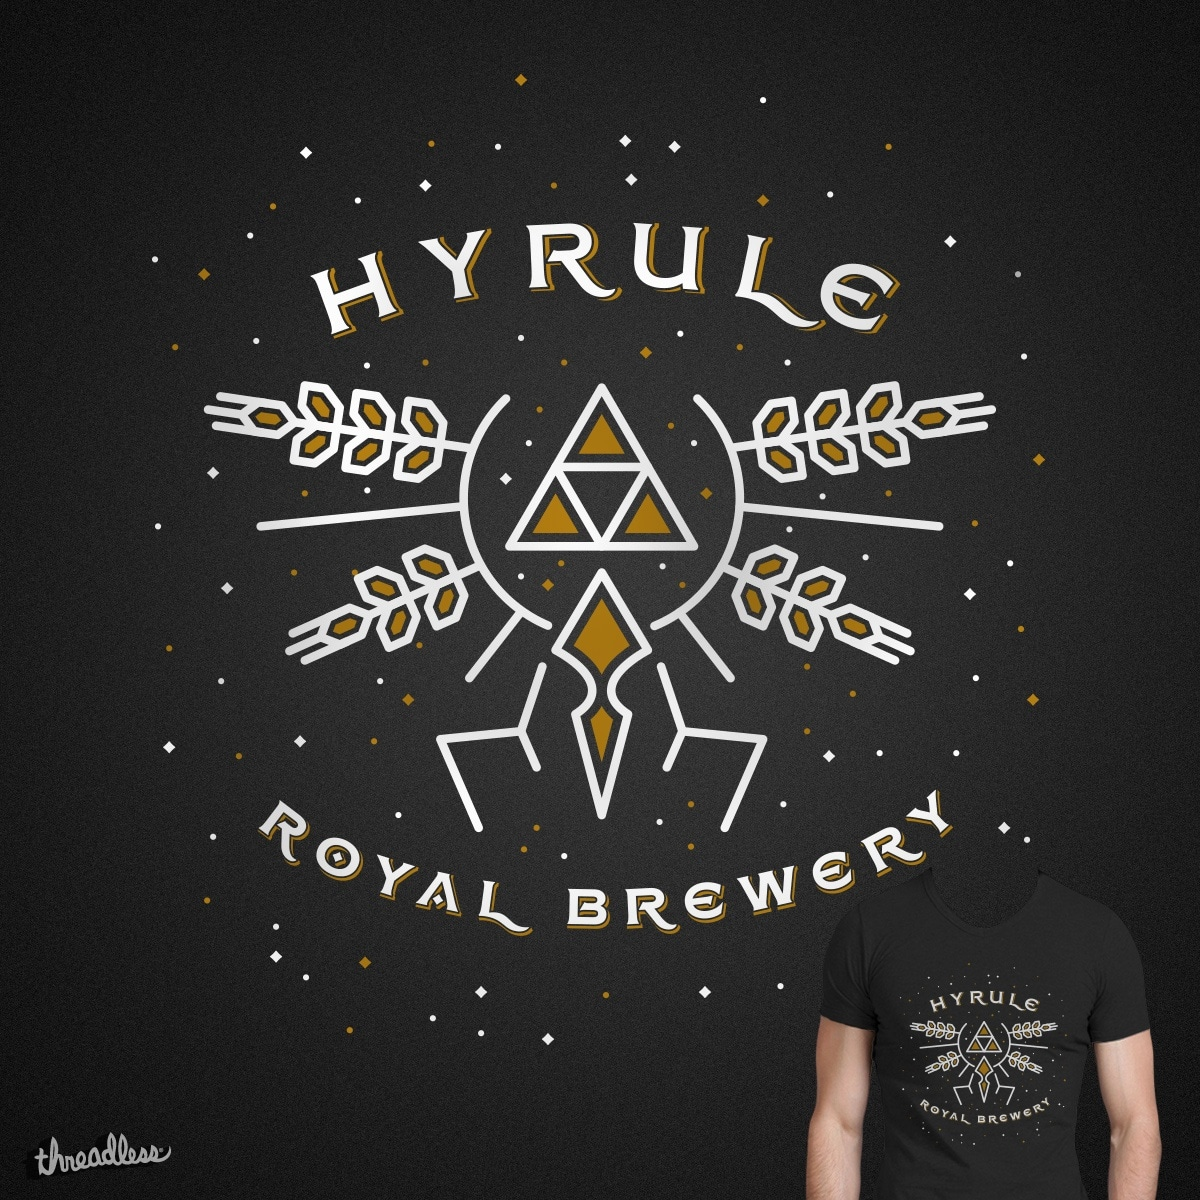 HYRULE ROYAL BREWERY by tugrulpeker on Threadless